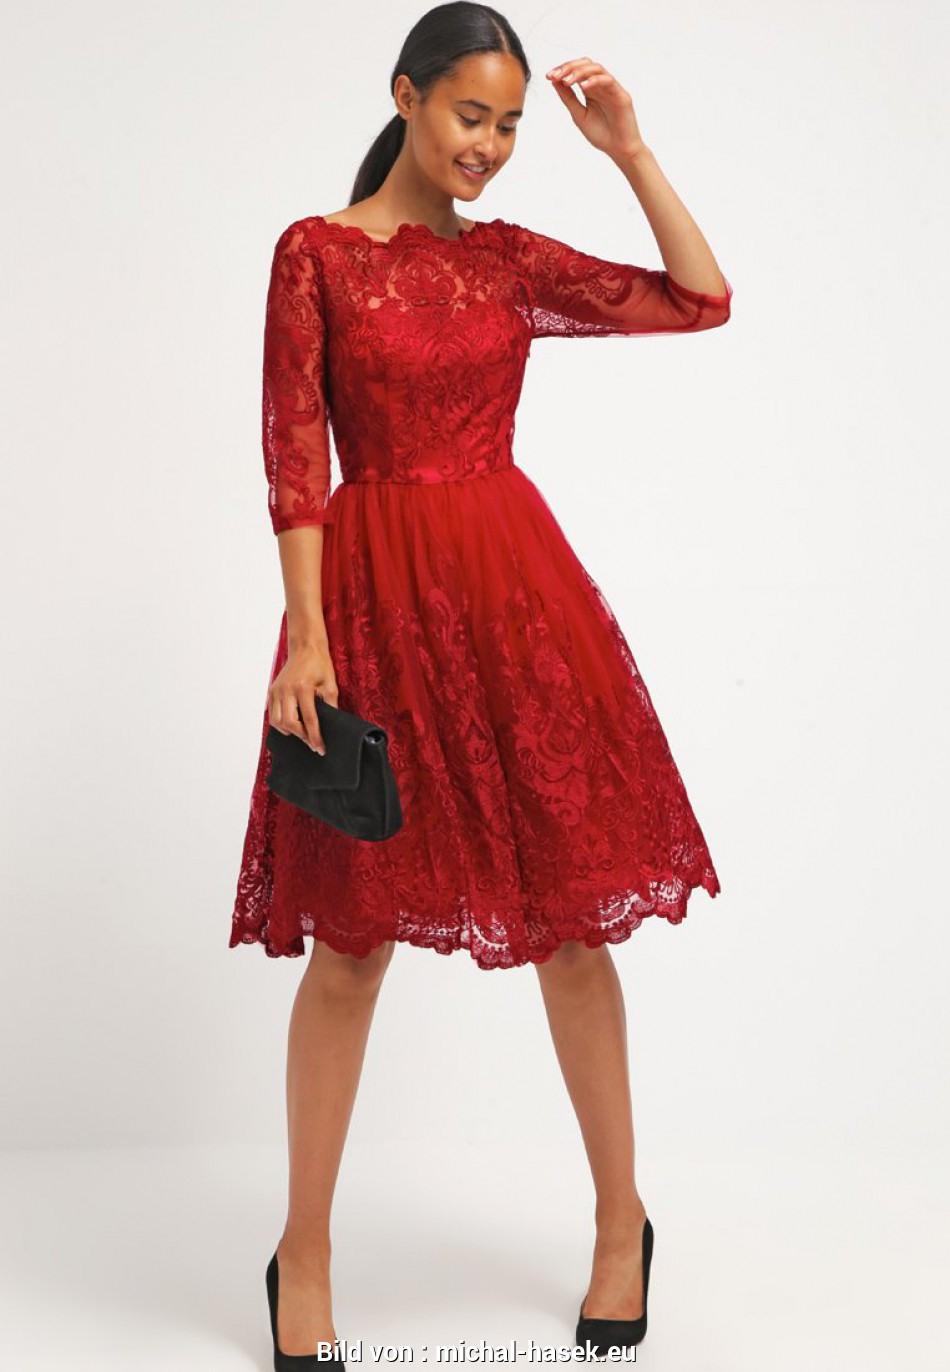 20 Elegant Zalando Rotes Abendkleid Boutique Ausgezeichnet Zalando Rotes Abendkleid Bester Preis